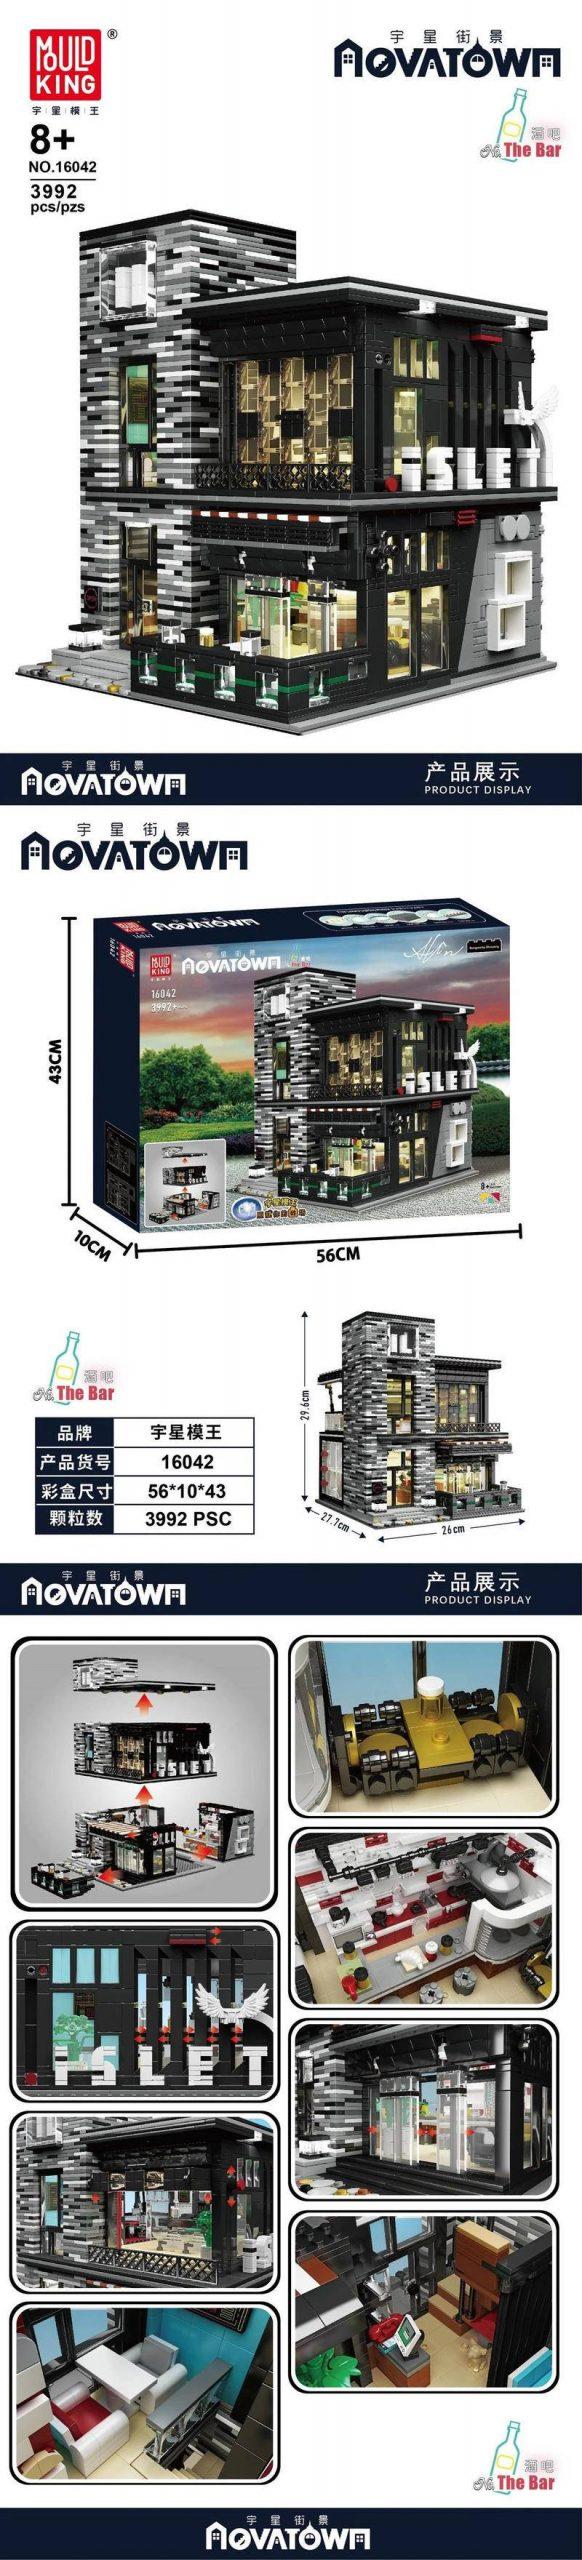 Modular buildings mouldking 16042 moc-53084 pub & restaurant modular 'islet'